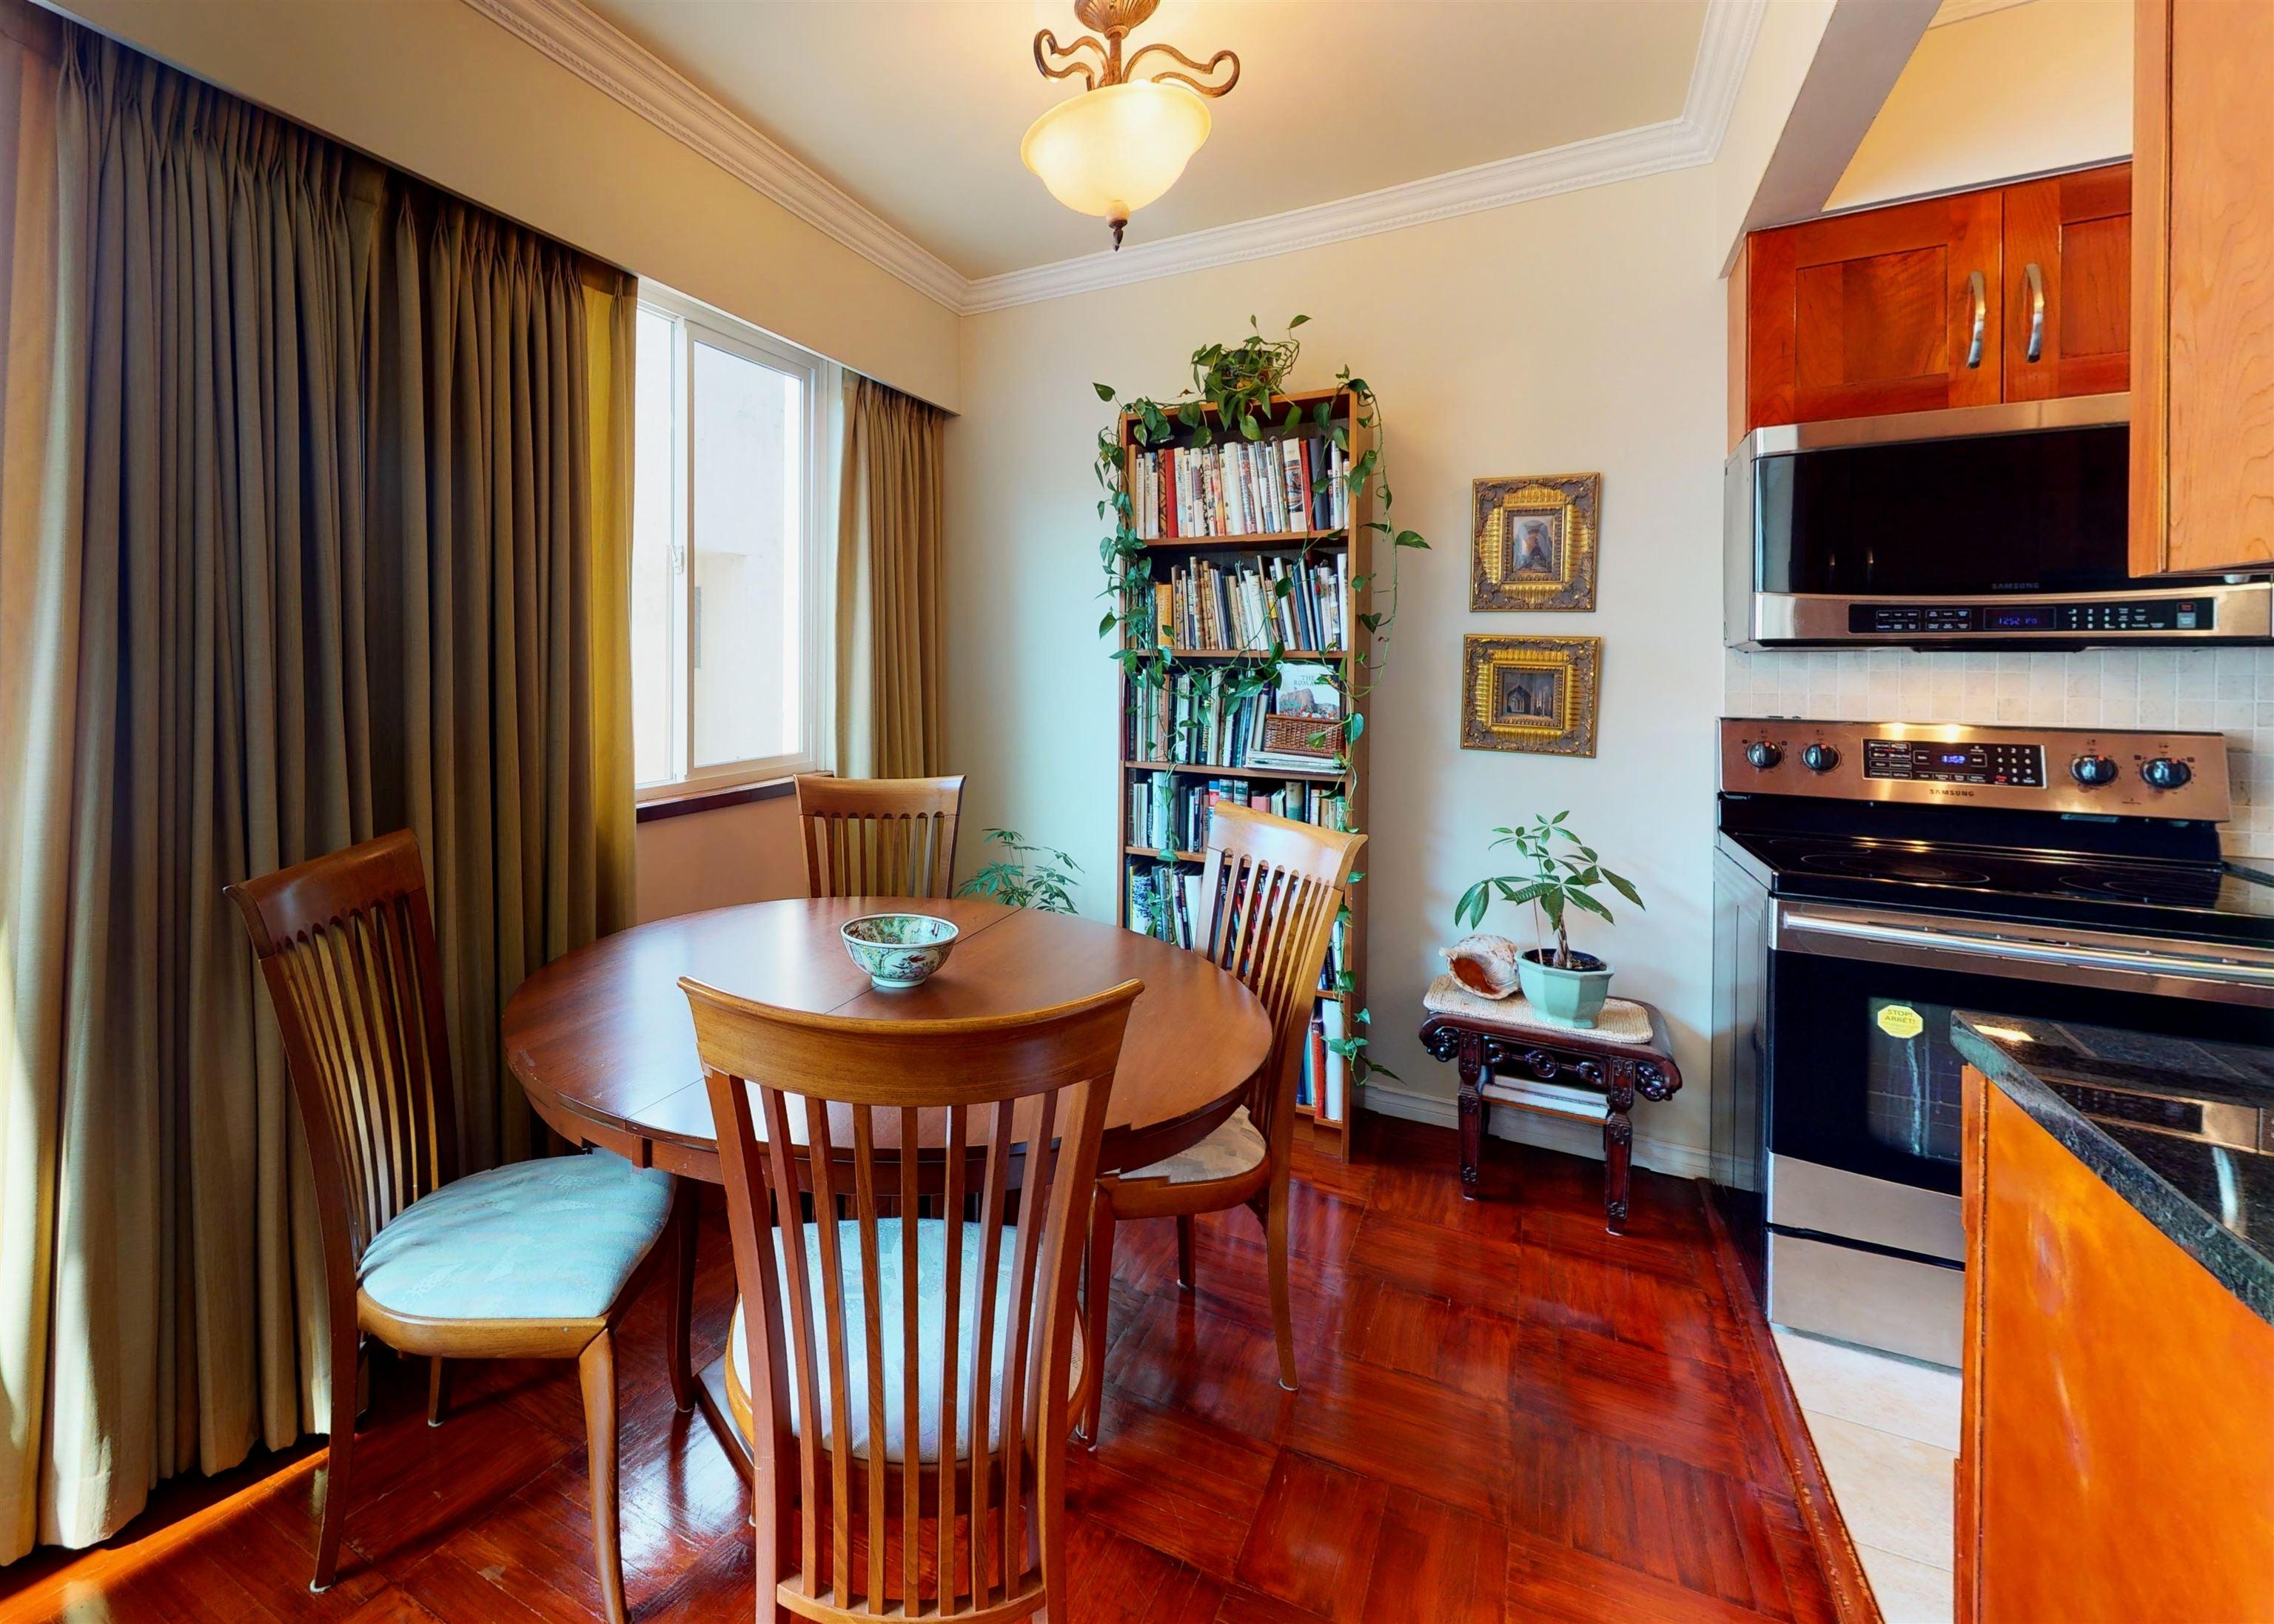 202 1750 ESQUIMALT AVENUE - Ambleside Apartment/Condo for sale, 1 Bedroom (R2610188) - #10